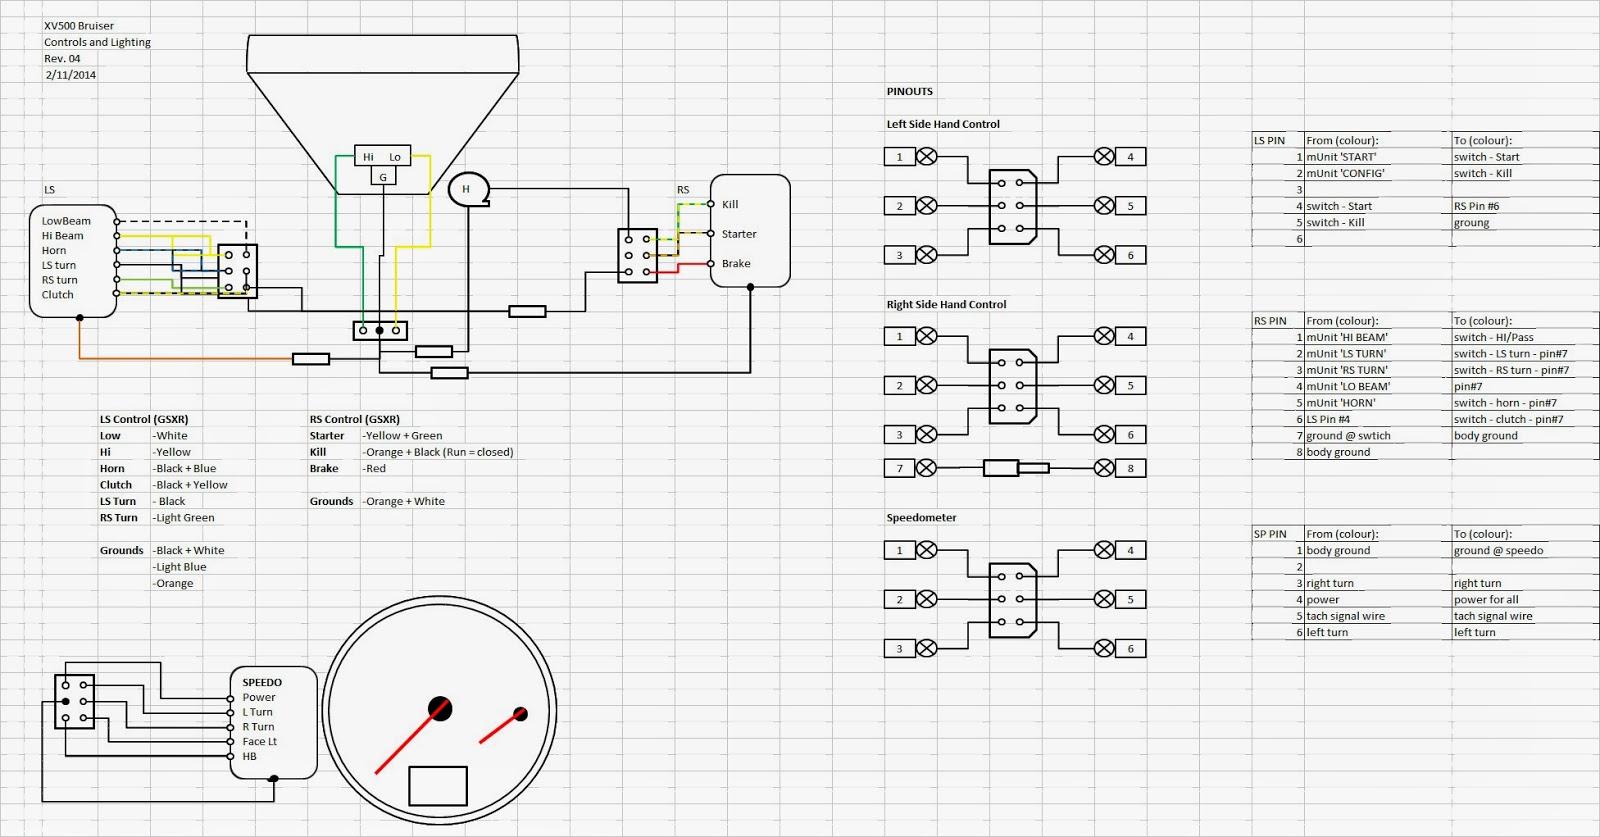 custom motorcycle wiring diagrams on 01 ford super duty fuse box Yamaha Warrior Wiring Diagram  Yamaha Xs400 Wiring Diagram Yamaha Xj1100 Wiring Diagram Yamaha Virago 920 Manual